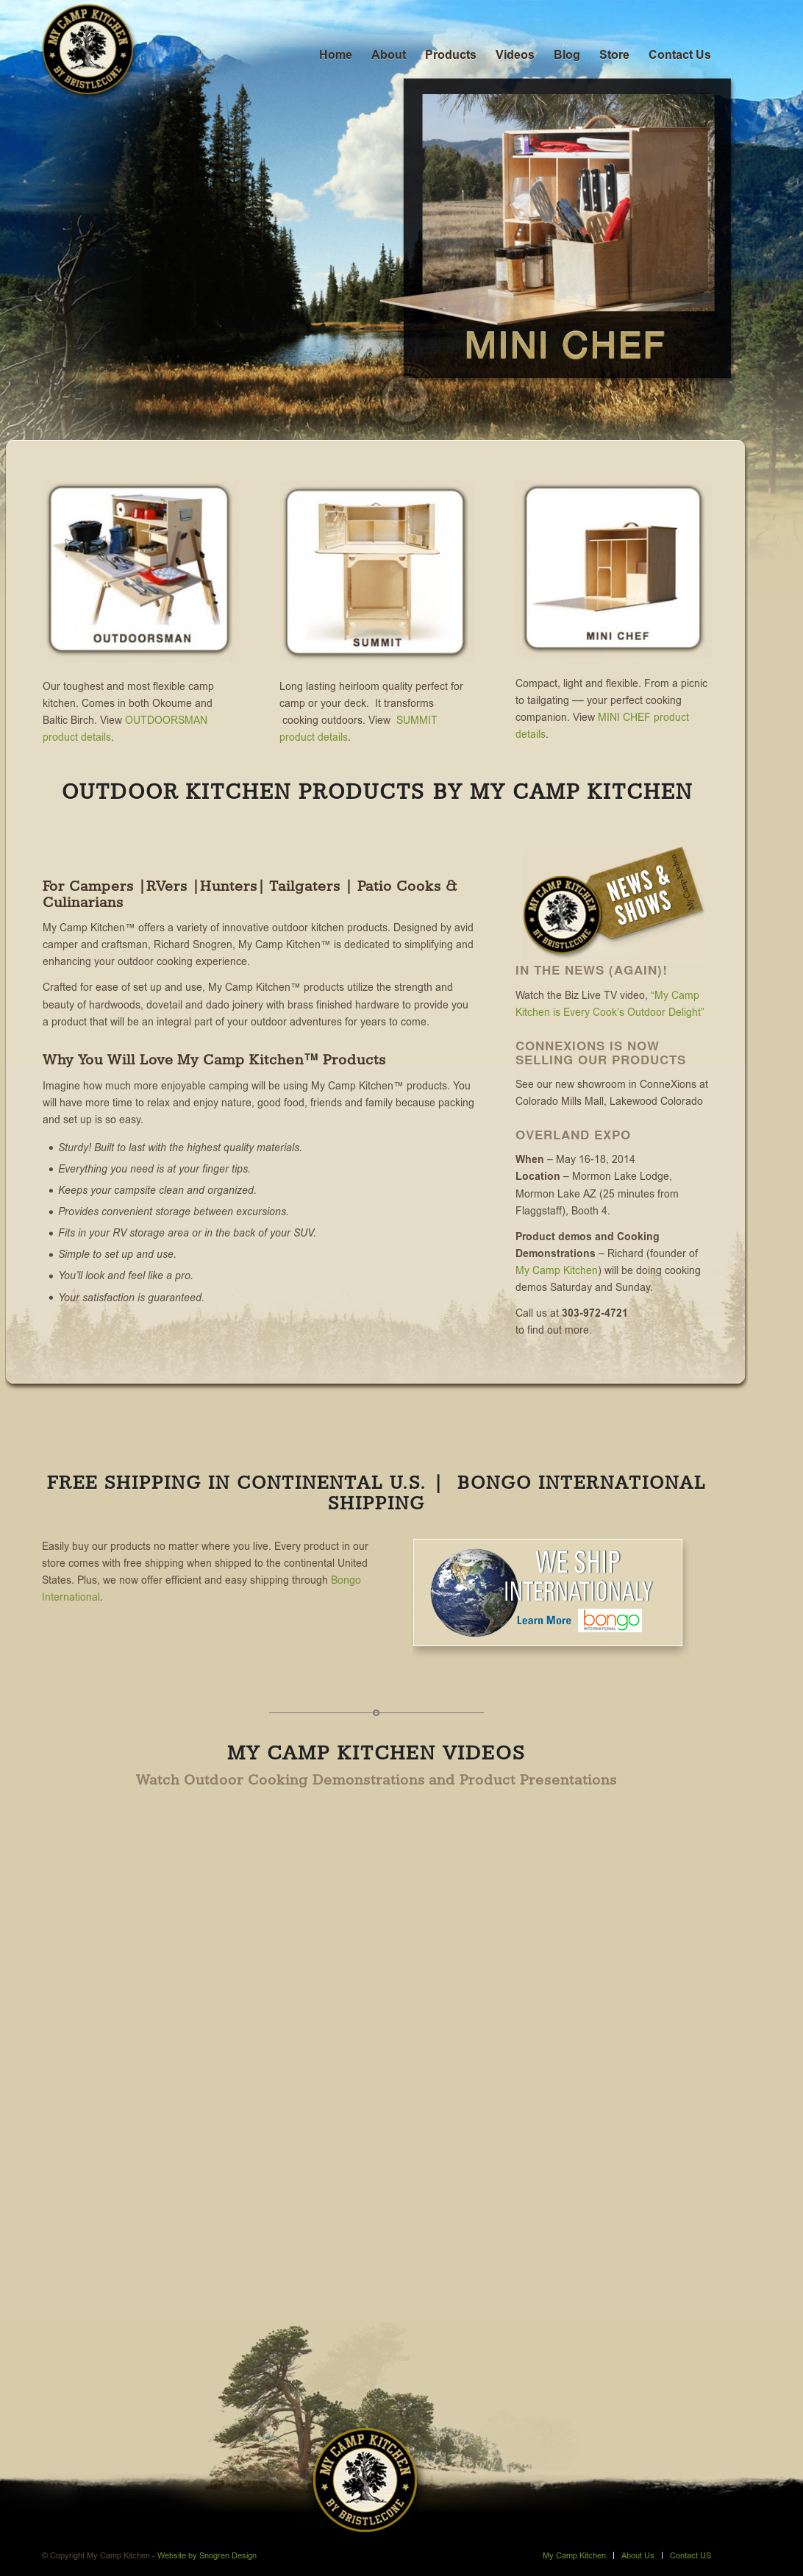 My Camp Kitchen By Bristlecone Competitors, Revenue and ...